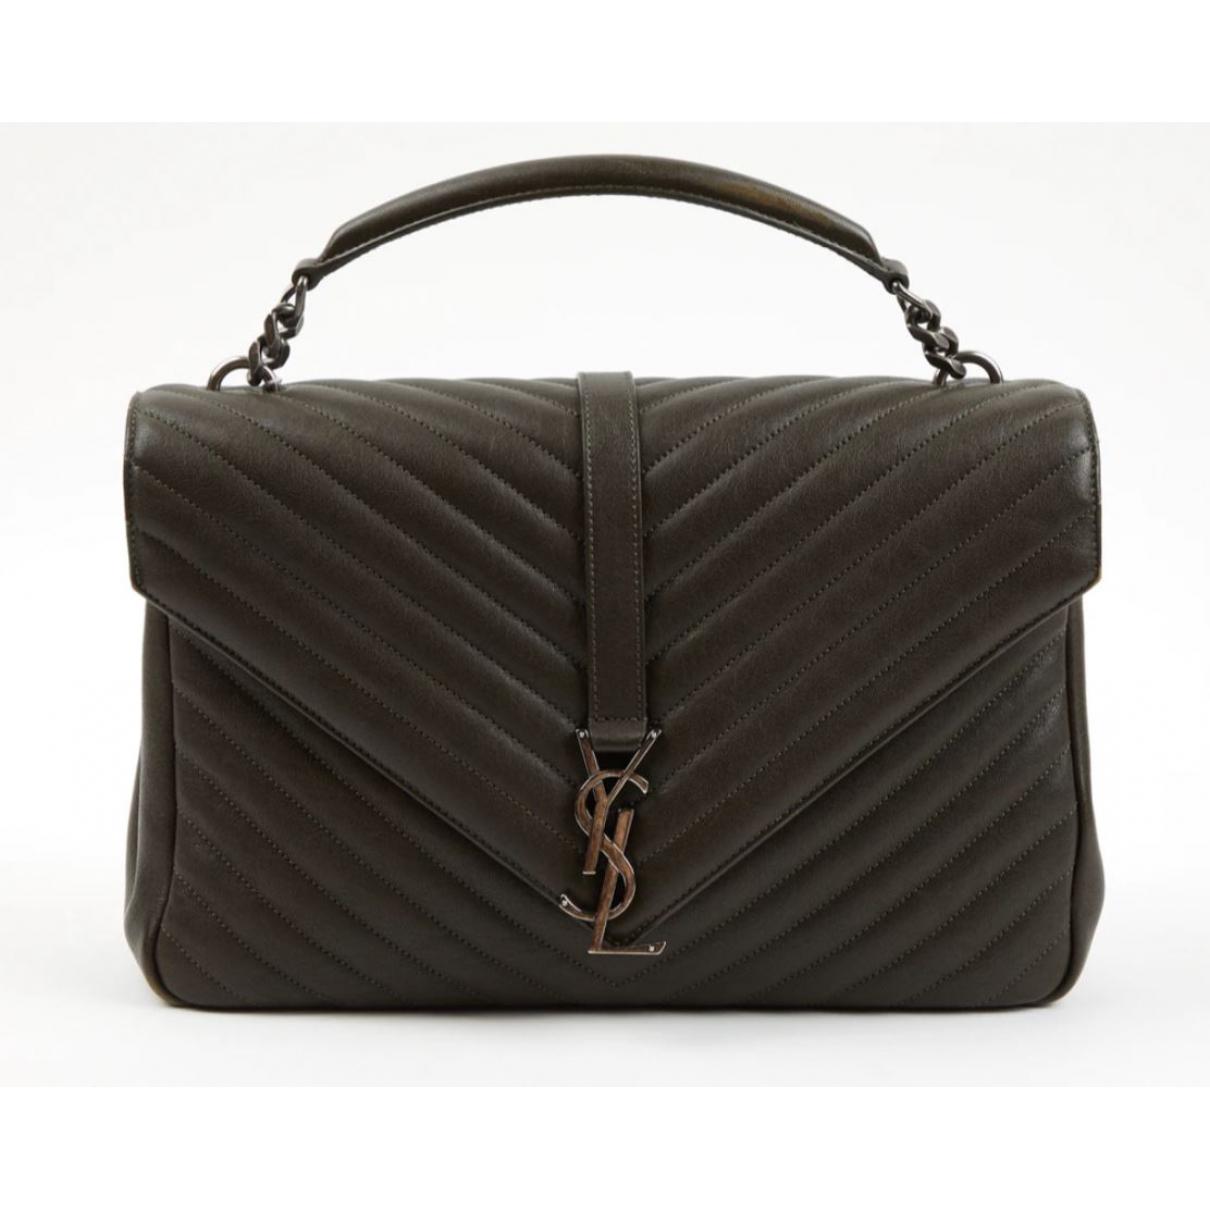 Saint Laurent Collége monogramme Khaki Leather handbag for Women \N